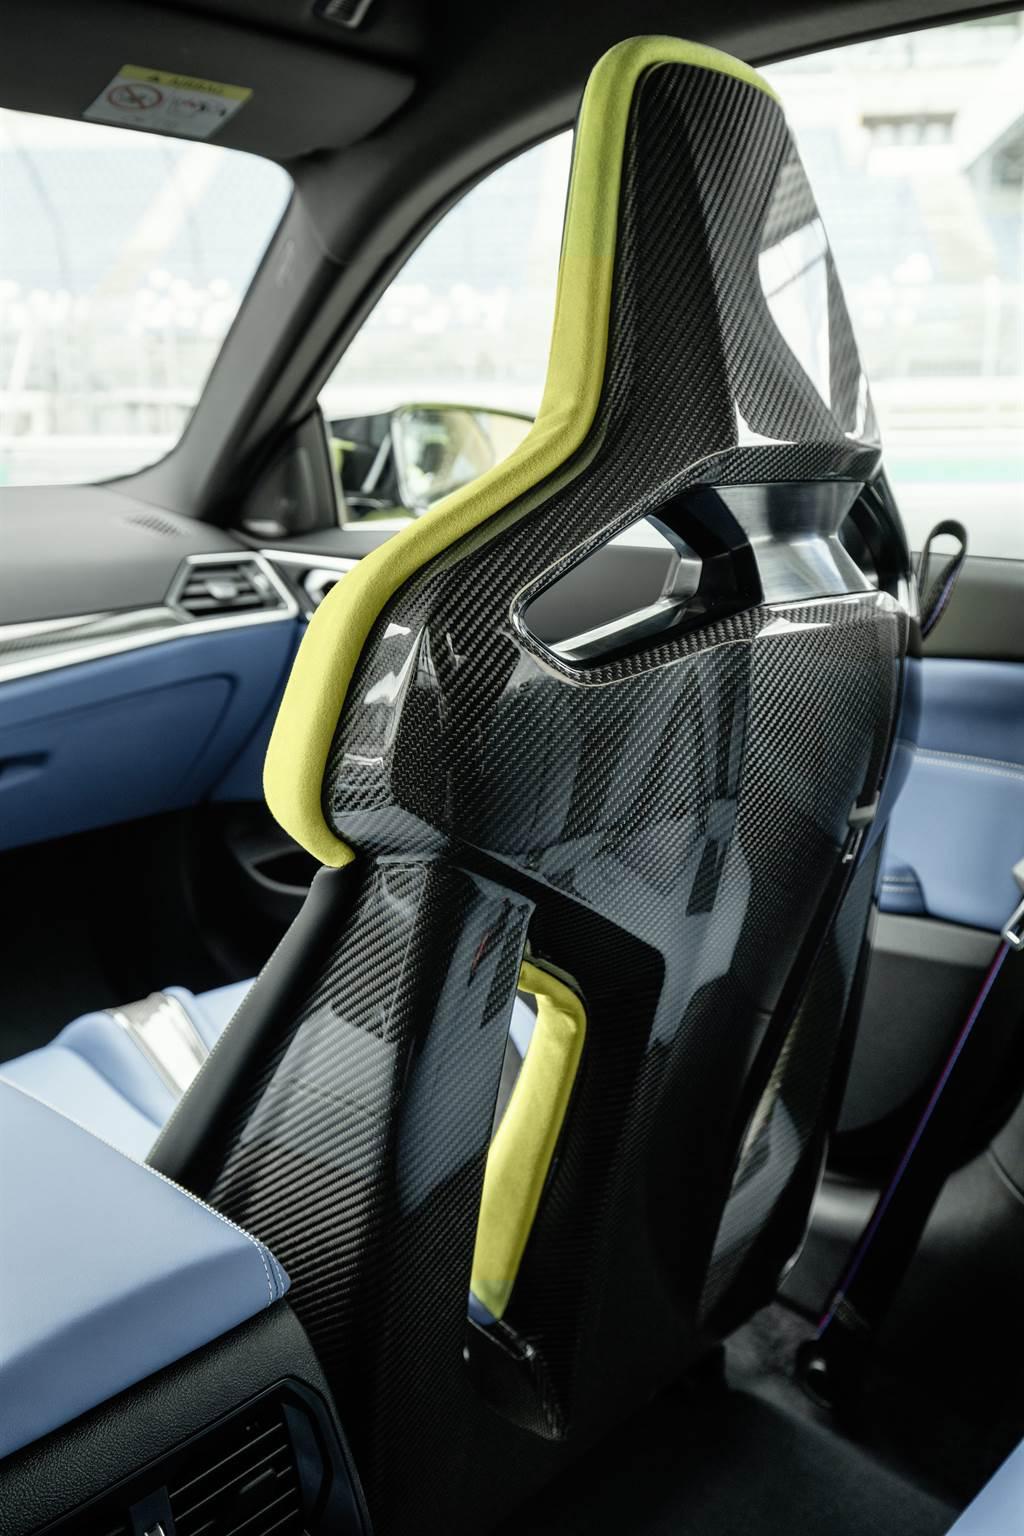 BMW M3與M4 Competition Racing Package搭載首次推出的「M專屬碳纖維賽車桶型座椅」,兼顧輕量與堅韌的全新設計。